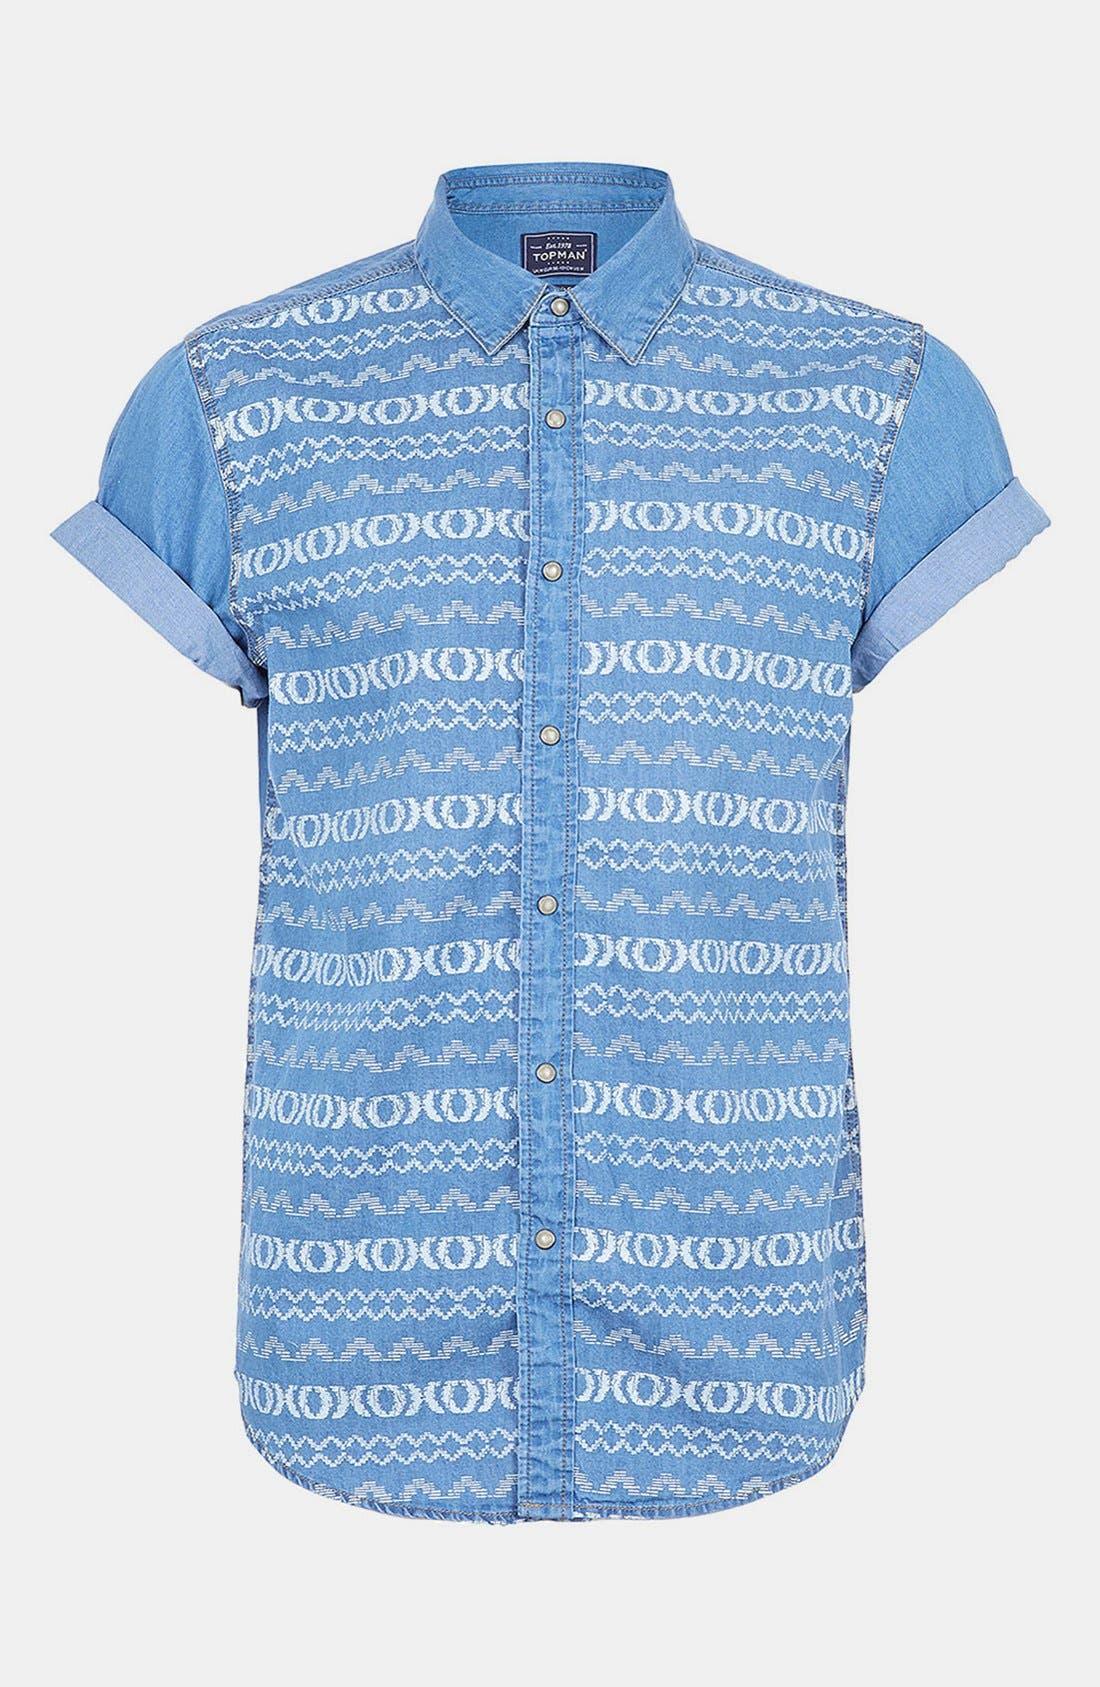 Alternate Image 1 Selected - Topman Short Sleeve Pattern Print Denim Shirt